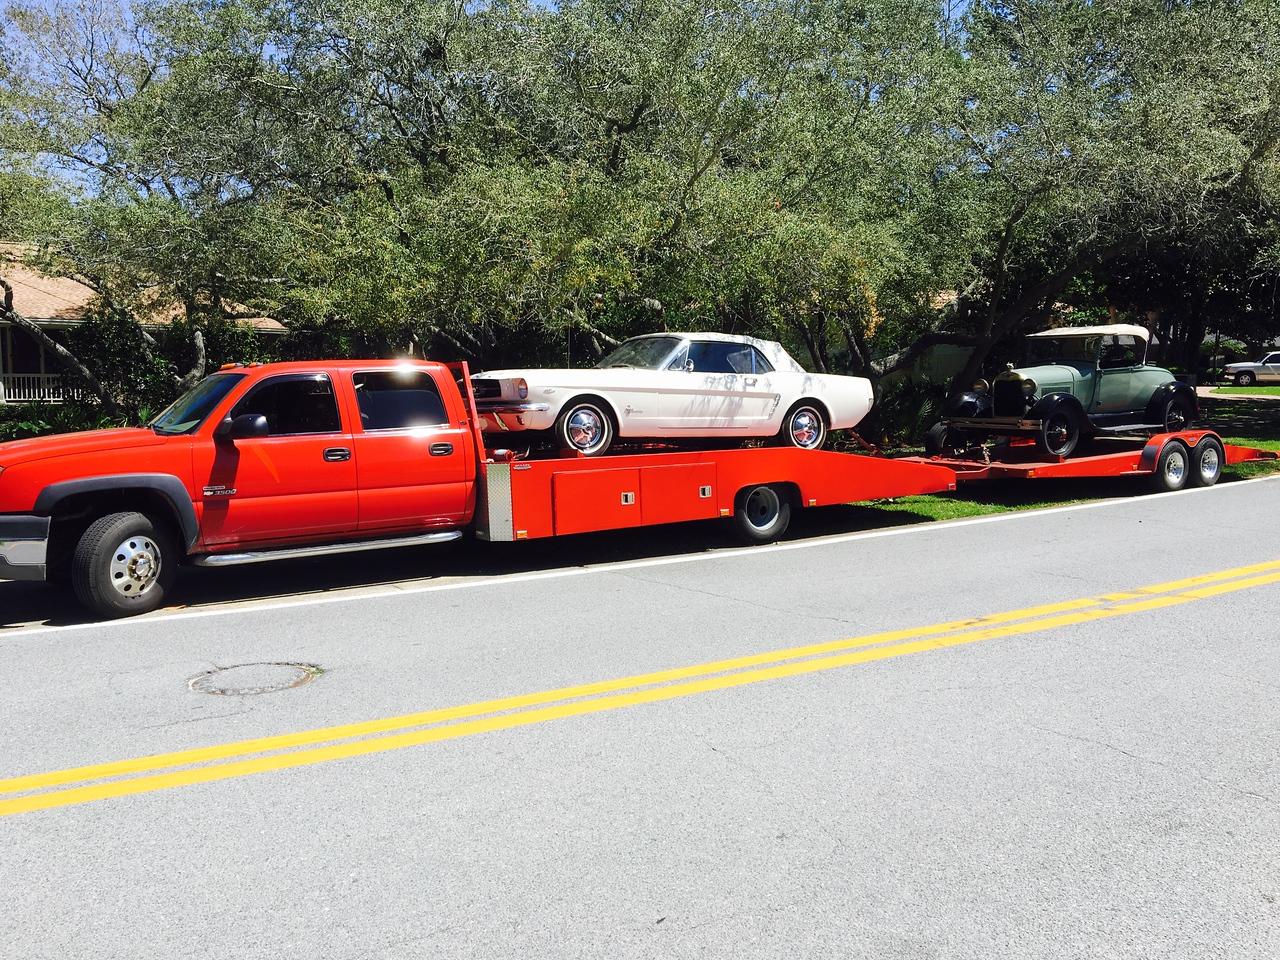 1965 Ford Mustang convertible and 1928 Ford Midel A AR (Destin,Florida to Bradenton, Florida)